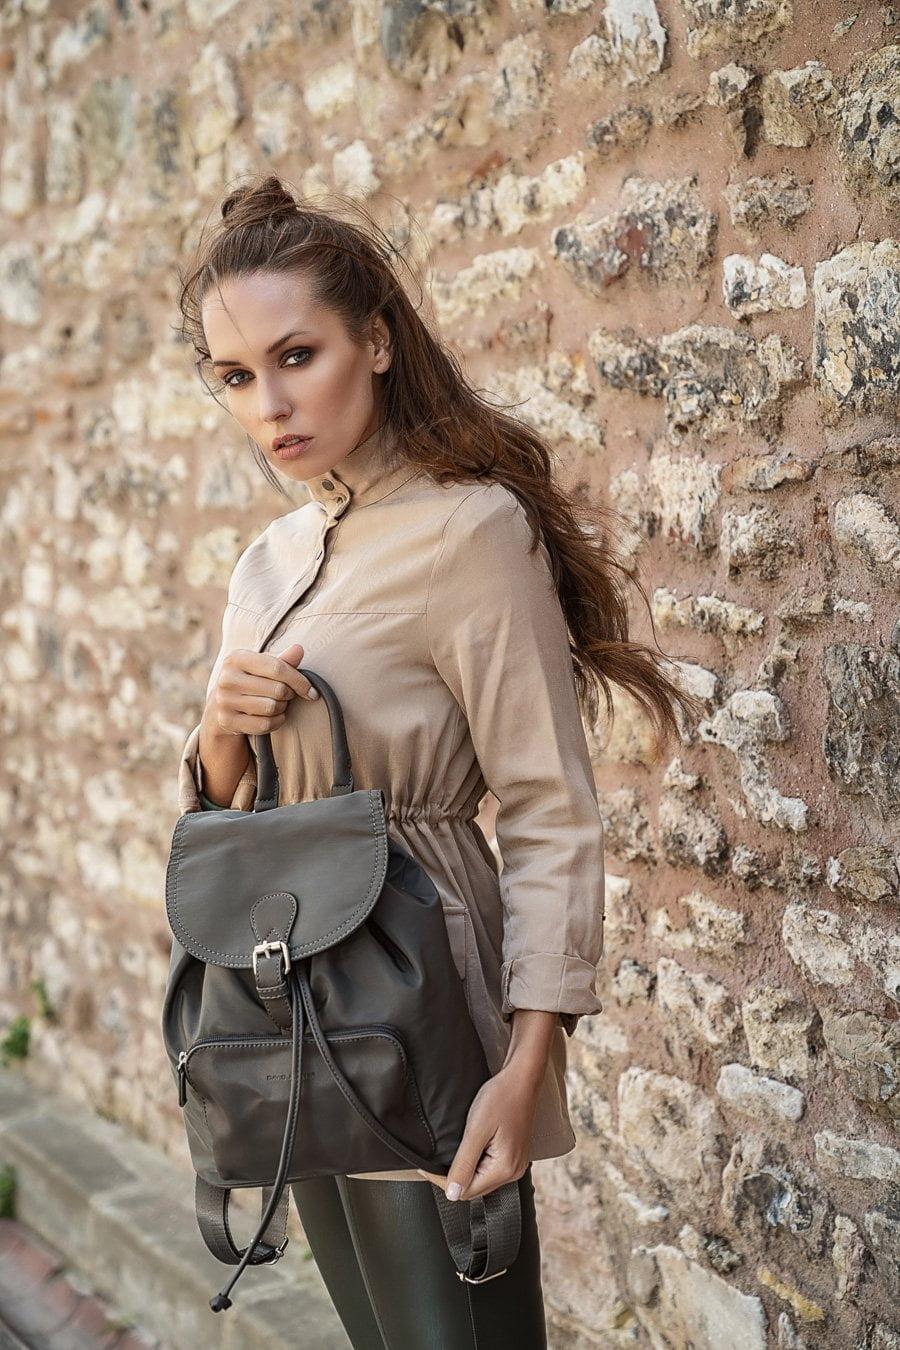 Moda Çekimi - Editorial - Beauty moda tekstil burakbulutfotografatolyesi 14